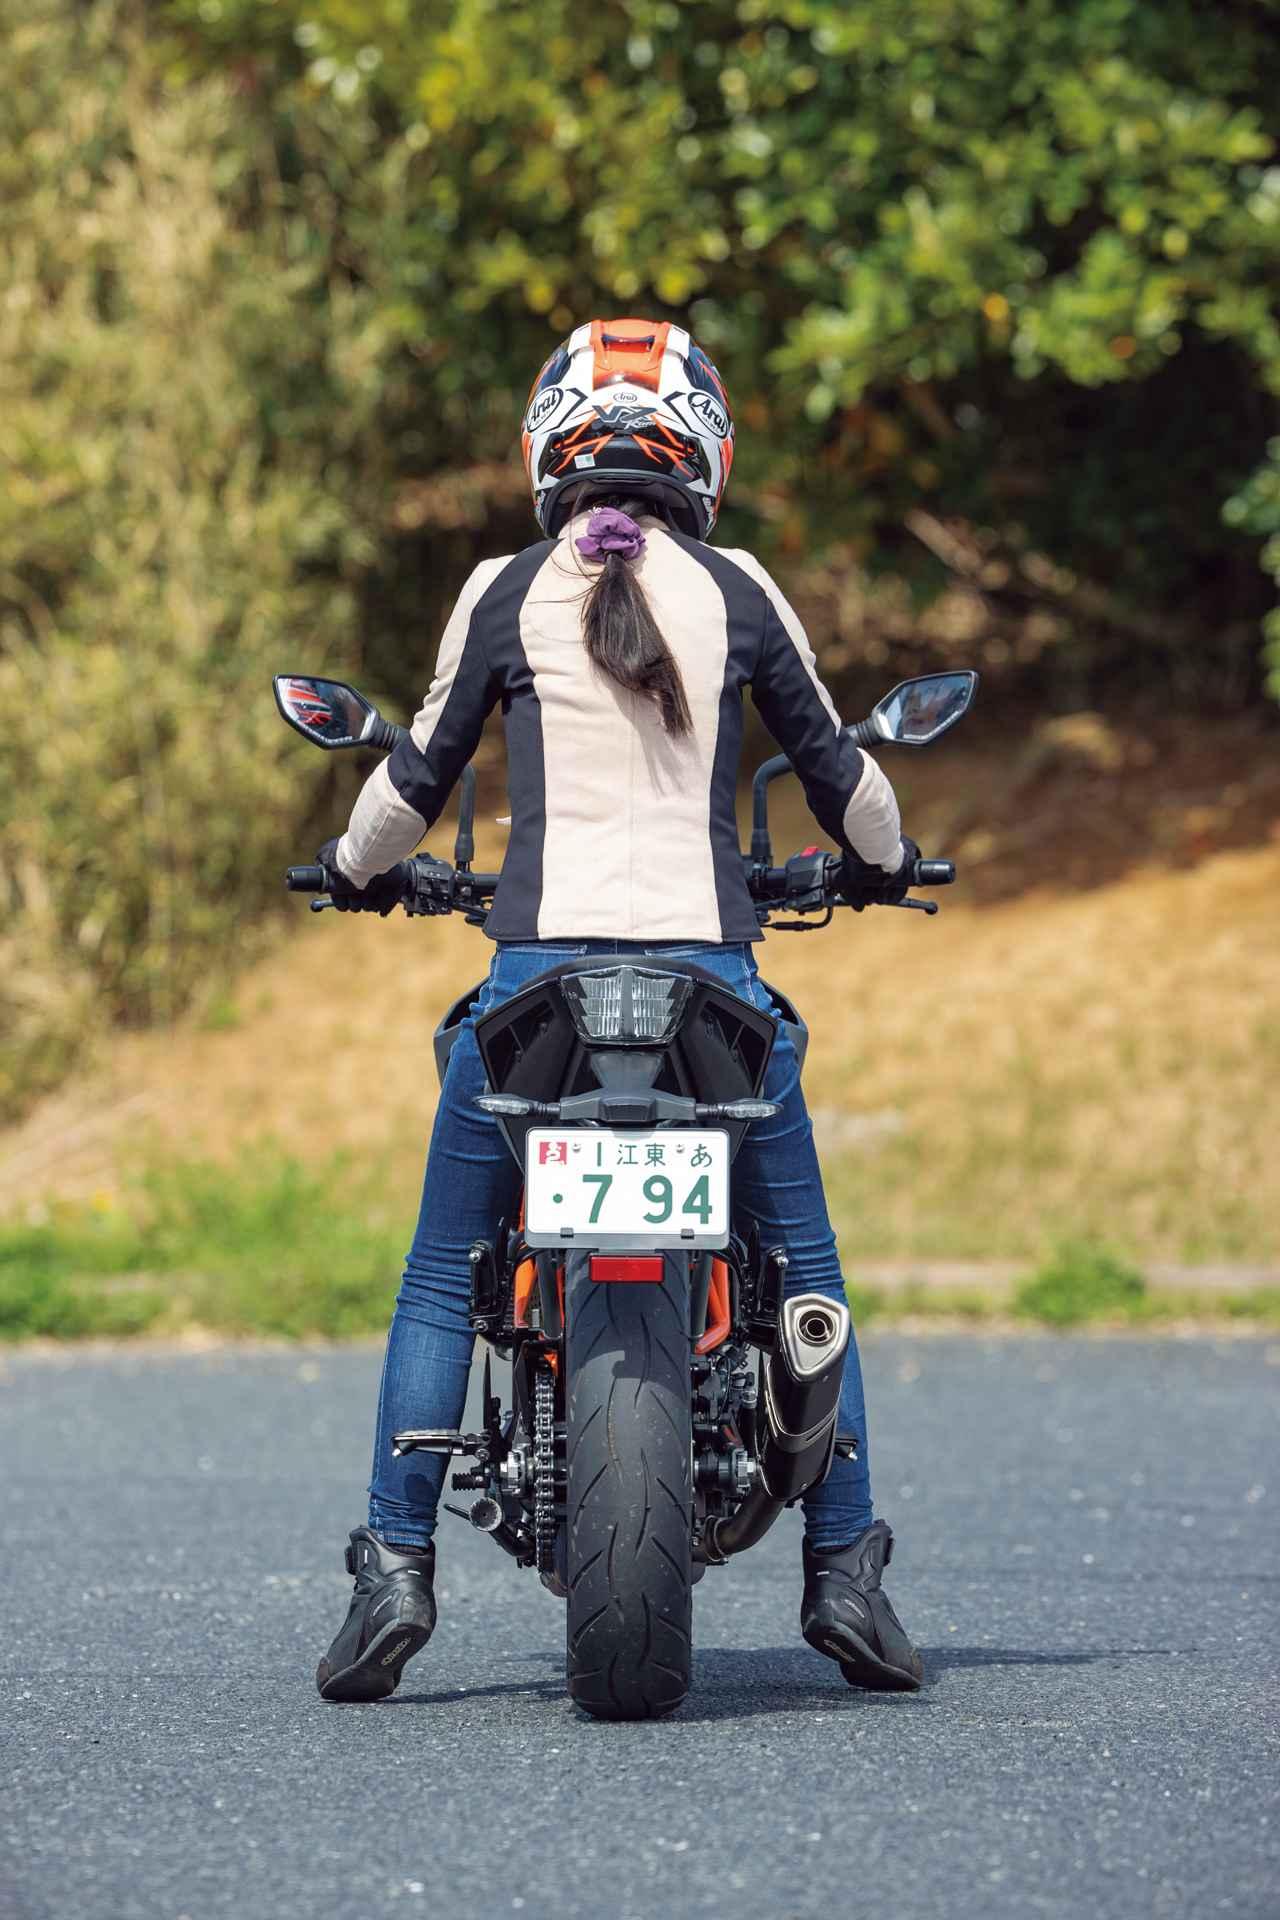 Images : 6番目の画像 - 【写真13枚】KTM「250 DUKE」2021年モデル - webオートバイ